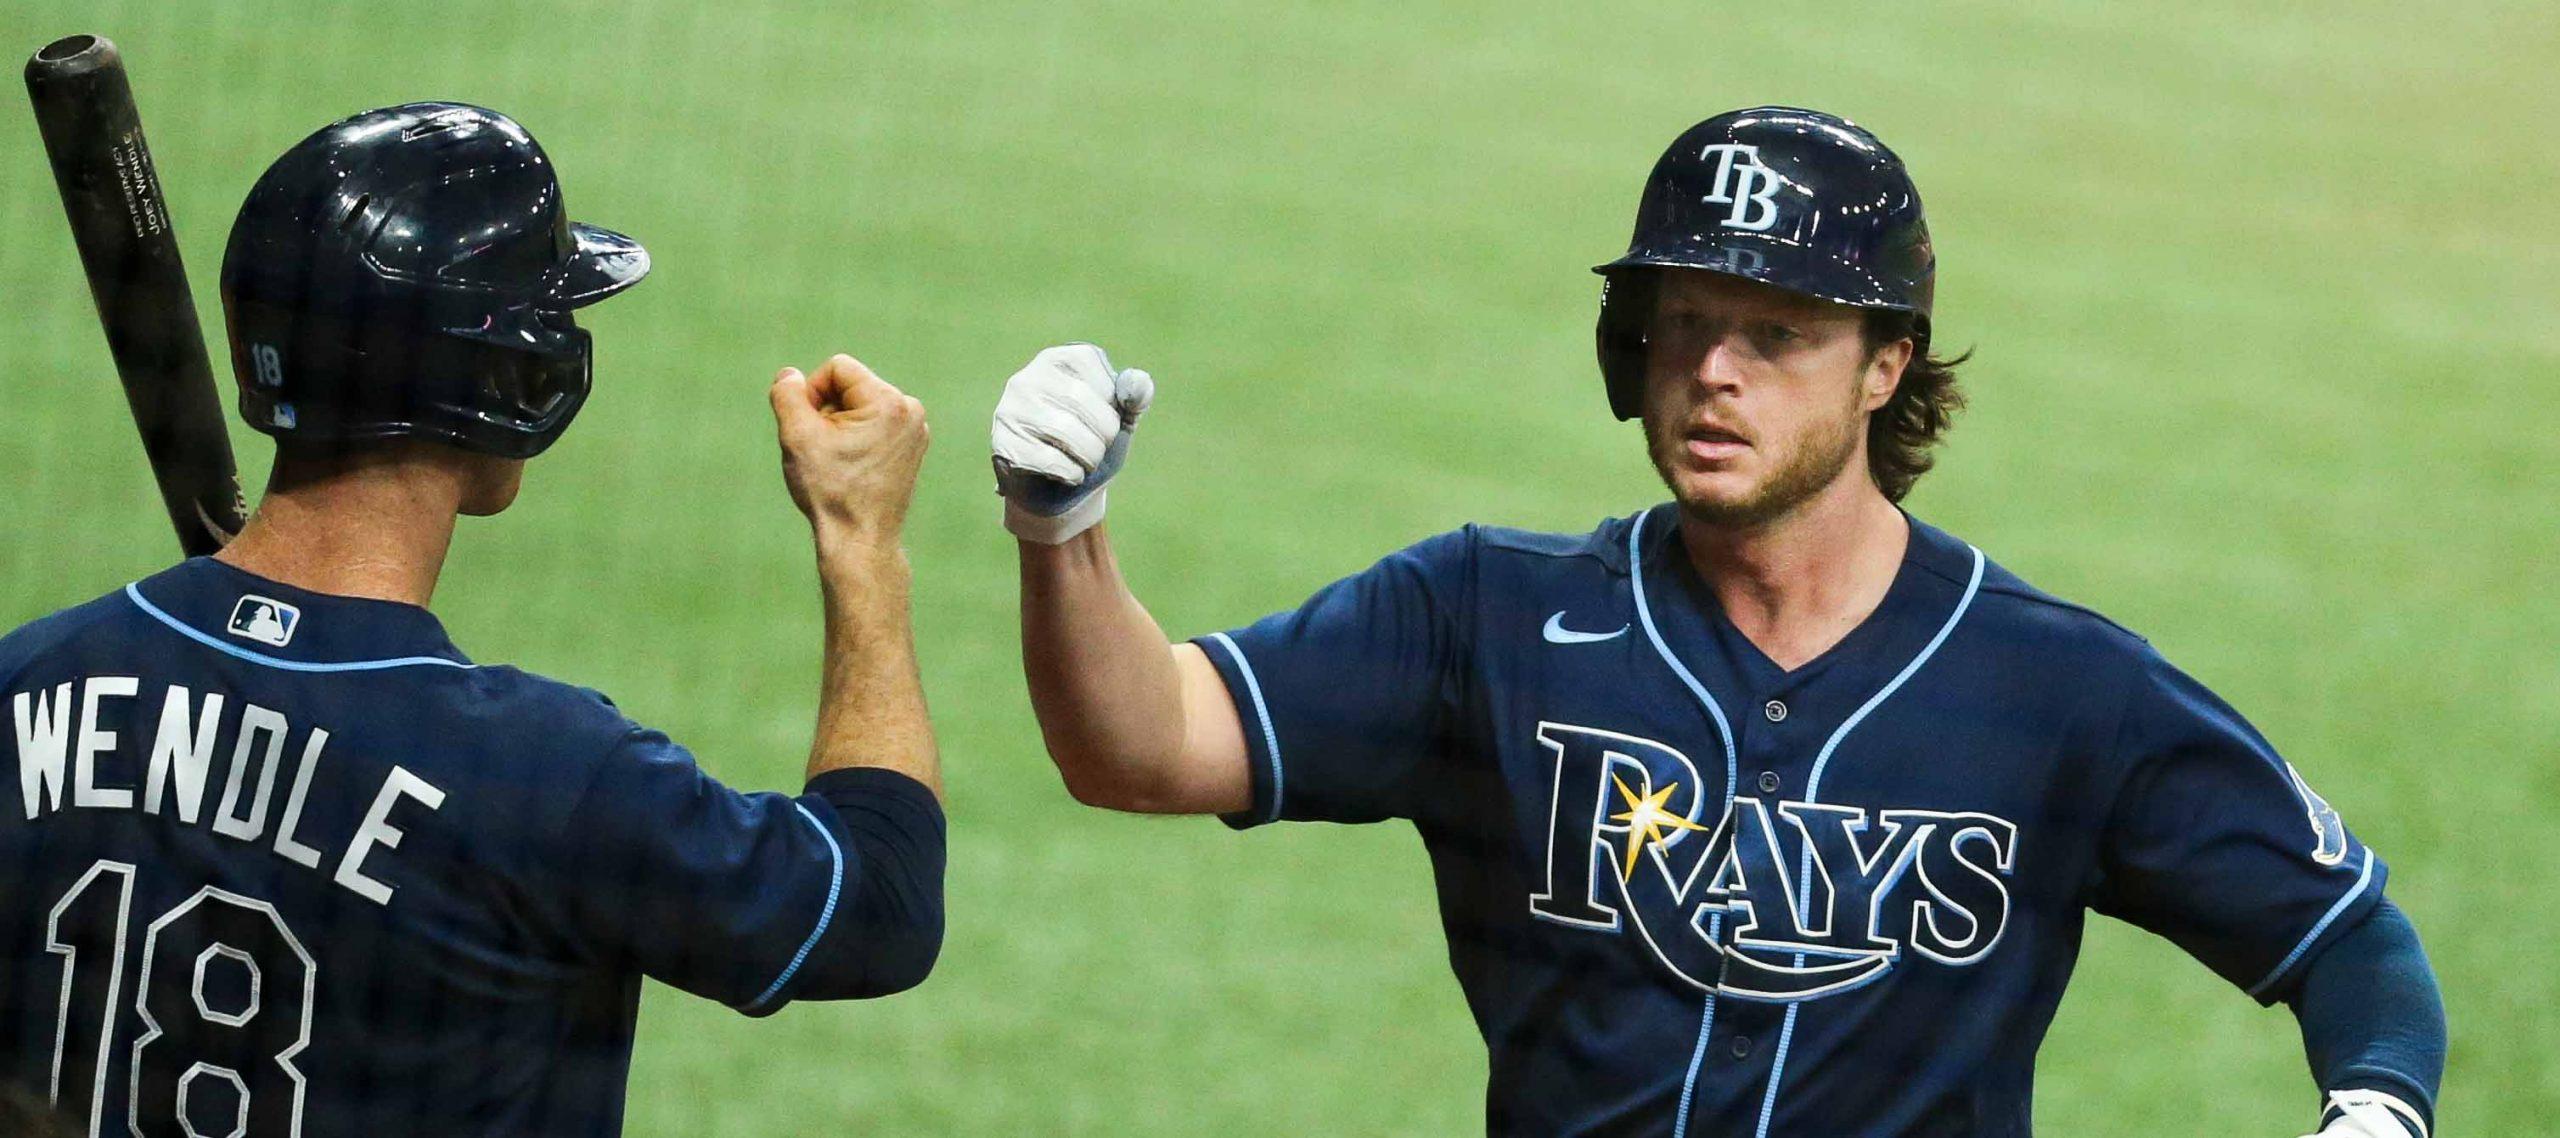 Rays vs Phillies MLB